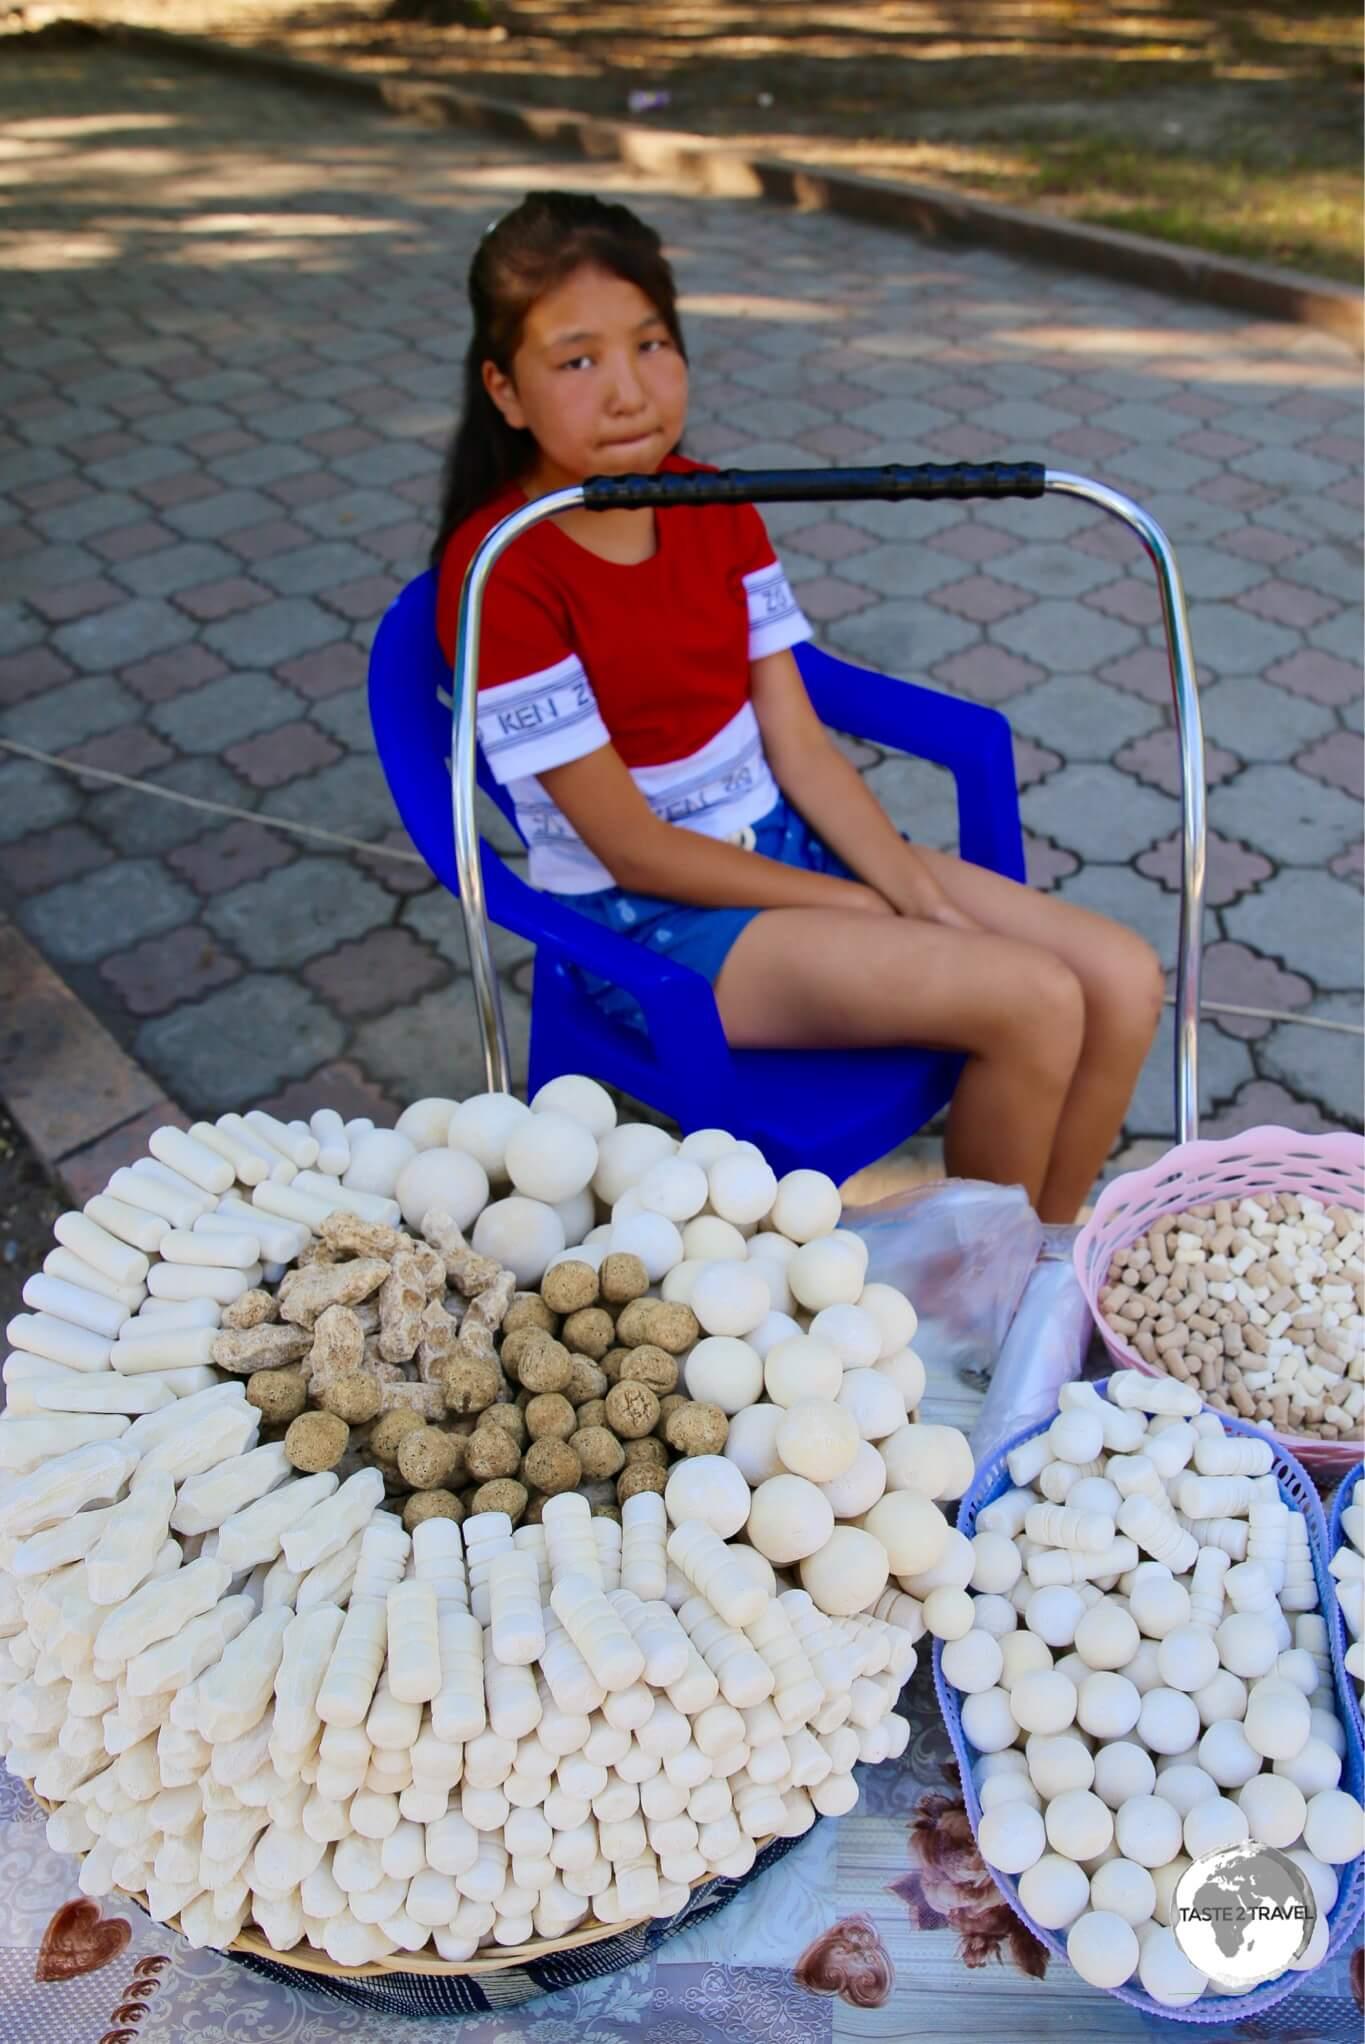 Selling Kashk or Qurt (a hard, salty fermented cheese snack) in Bishkek.